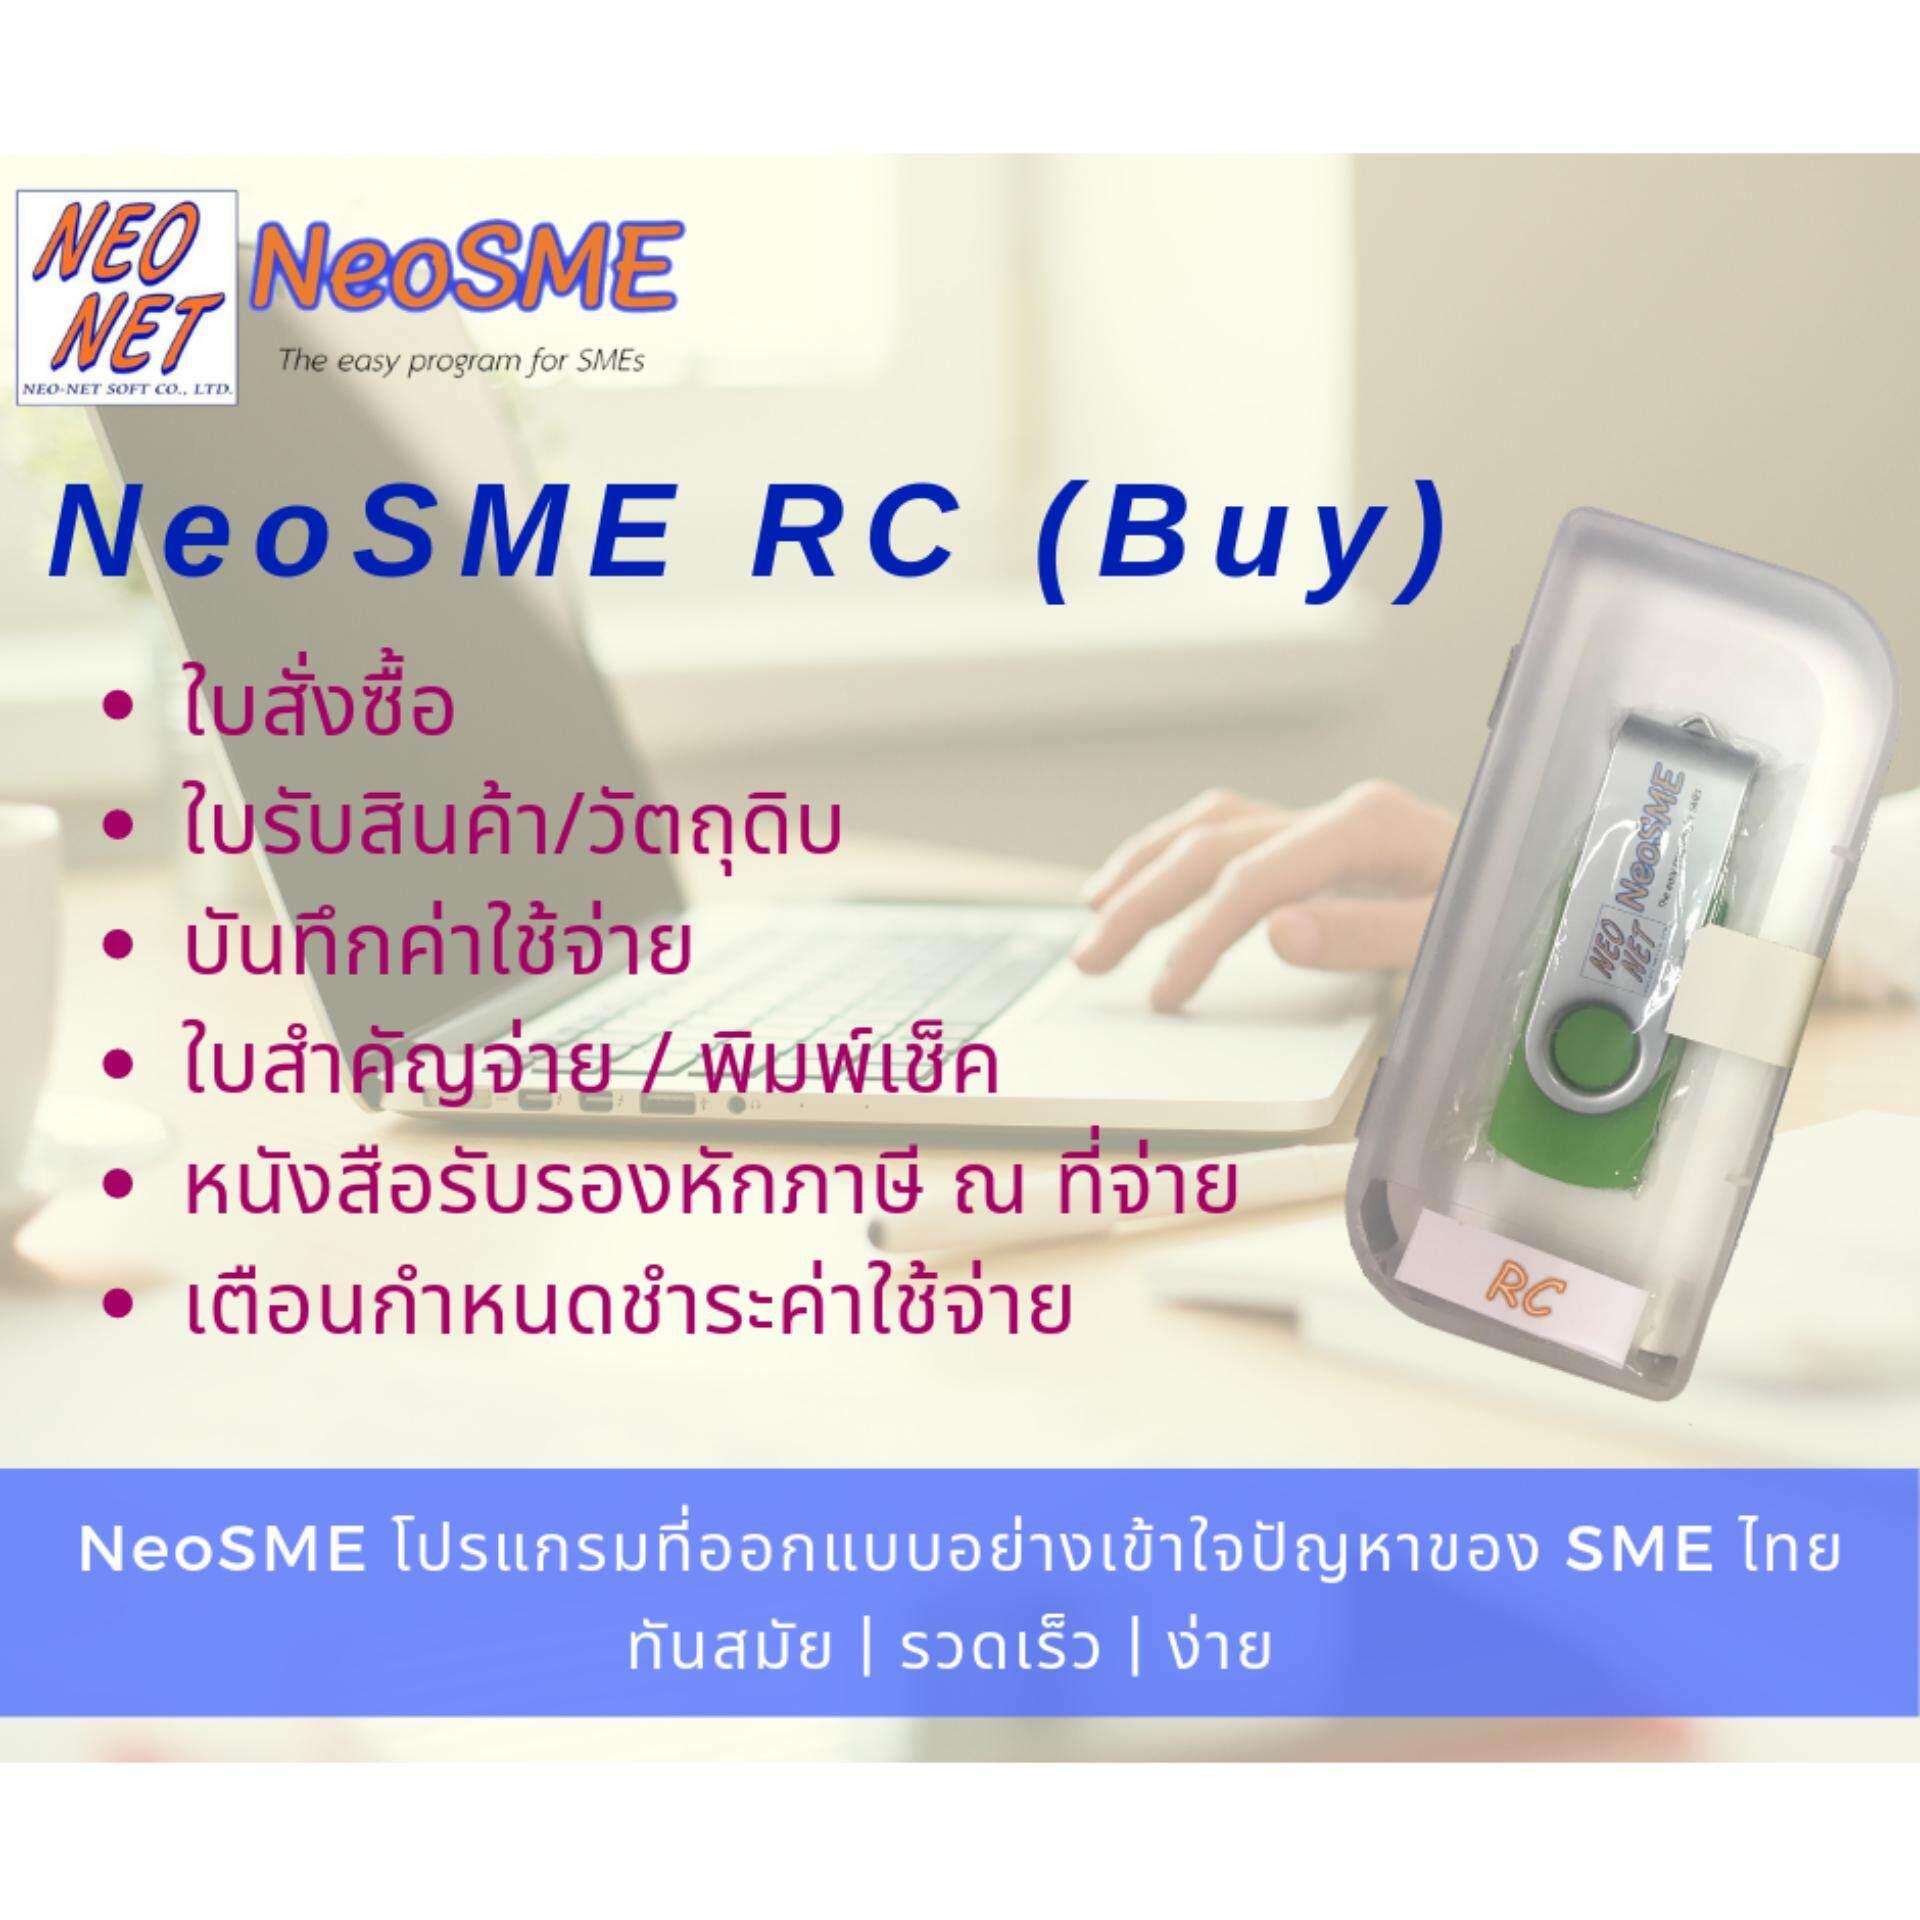 Neosme Rc โปรแกรมระบบซื้อและบันทึกค่าใช้จ่าย.